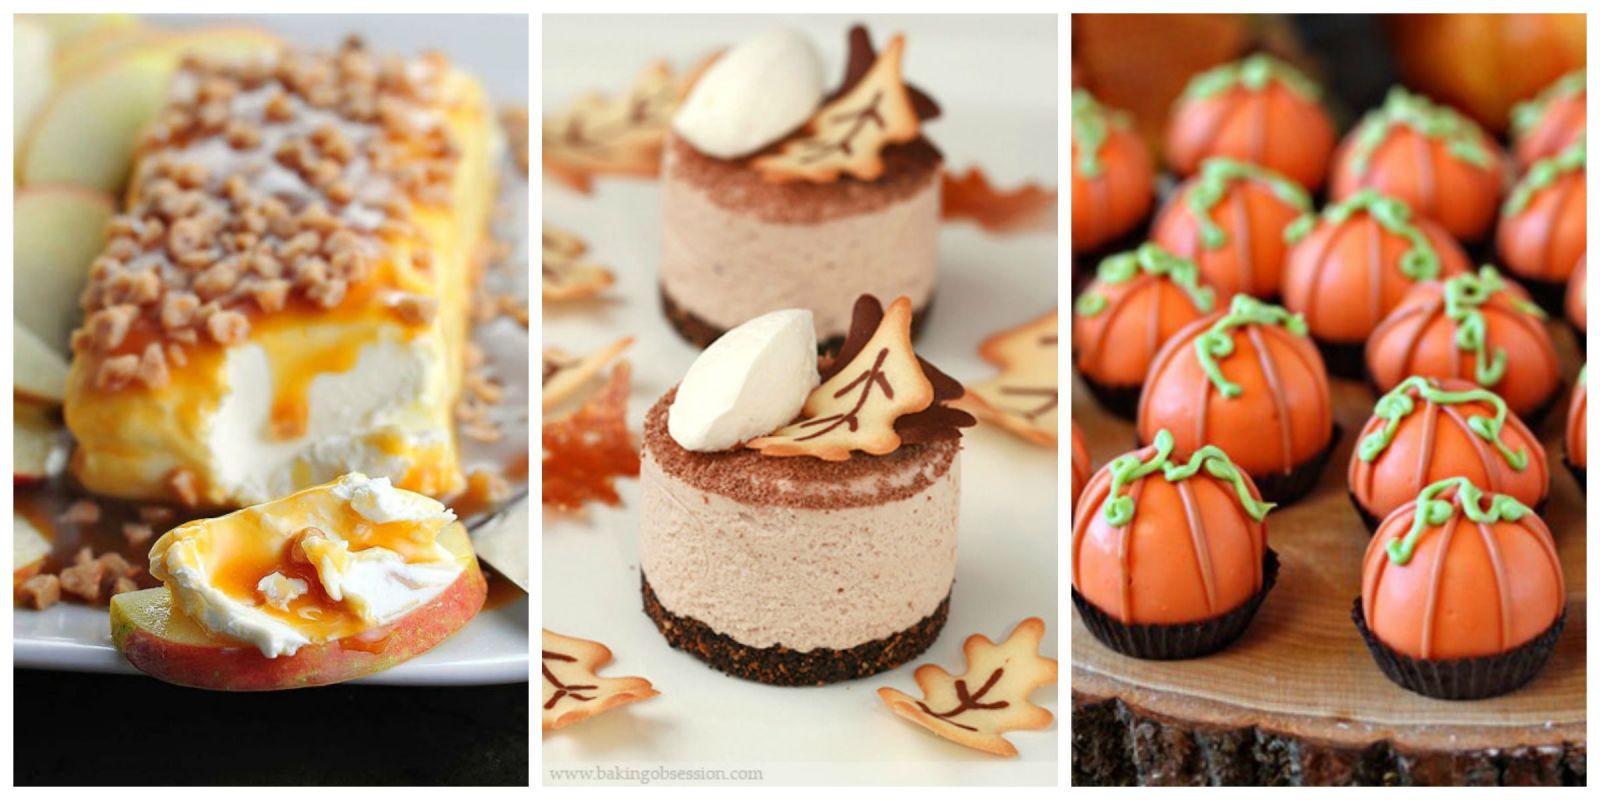 Easy Fall Dessert Recipes  35 Easy Fall Dessert Recipes Best Treats for Autumn Parties